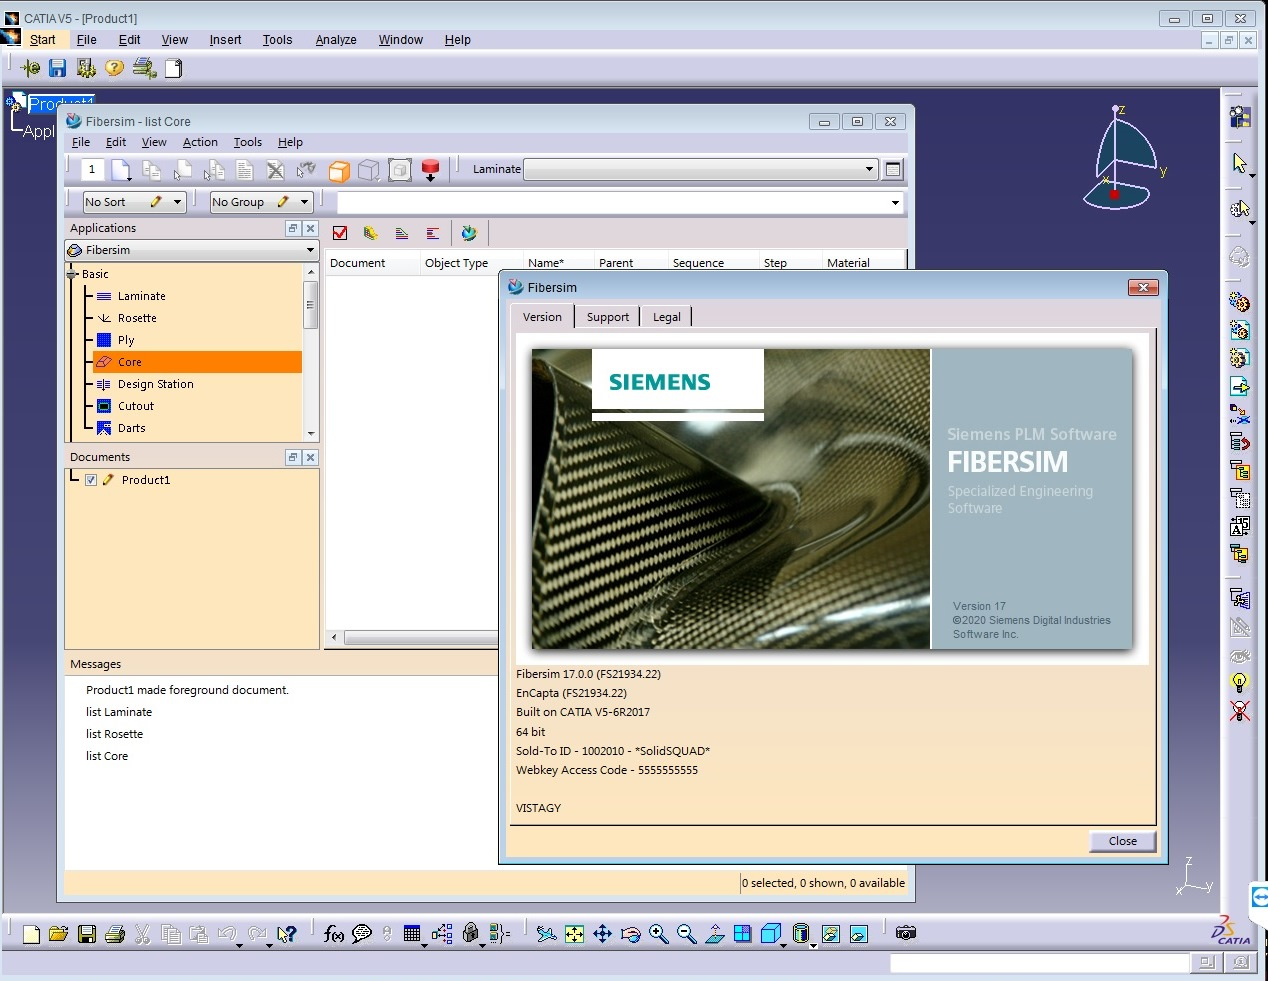 Working with Siemens FiberSIM 17.0.0 for catia v5 full license